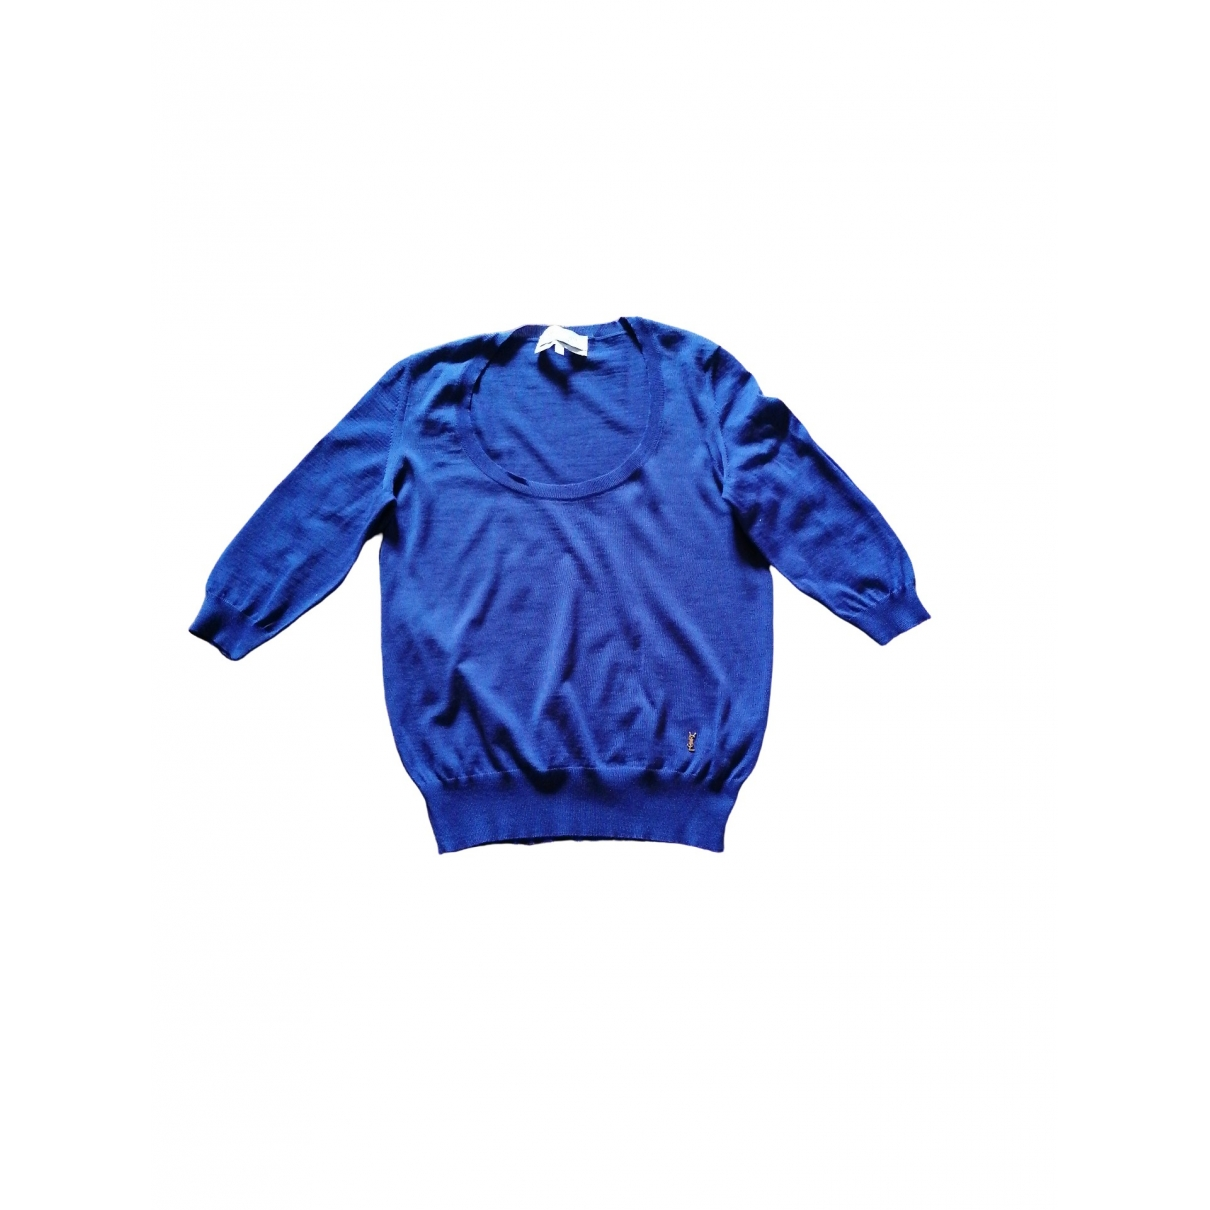 Yves Saint Laurent \N Purple Wool  top for Women L International